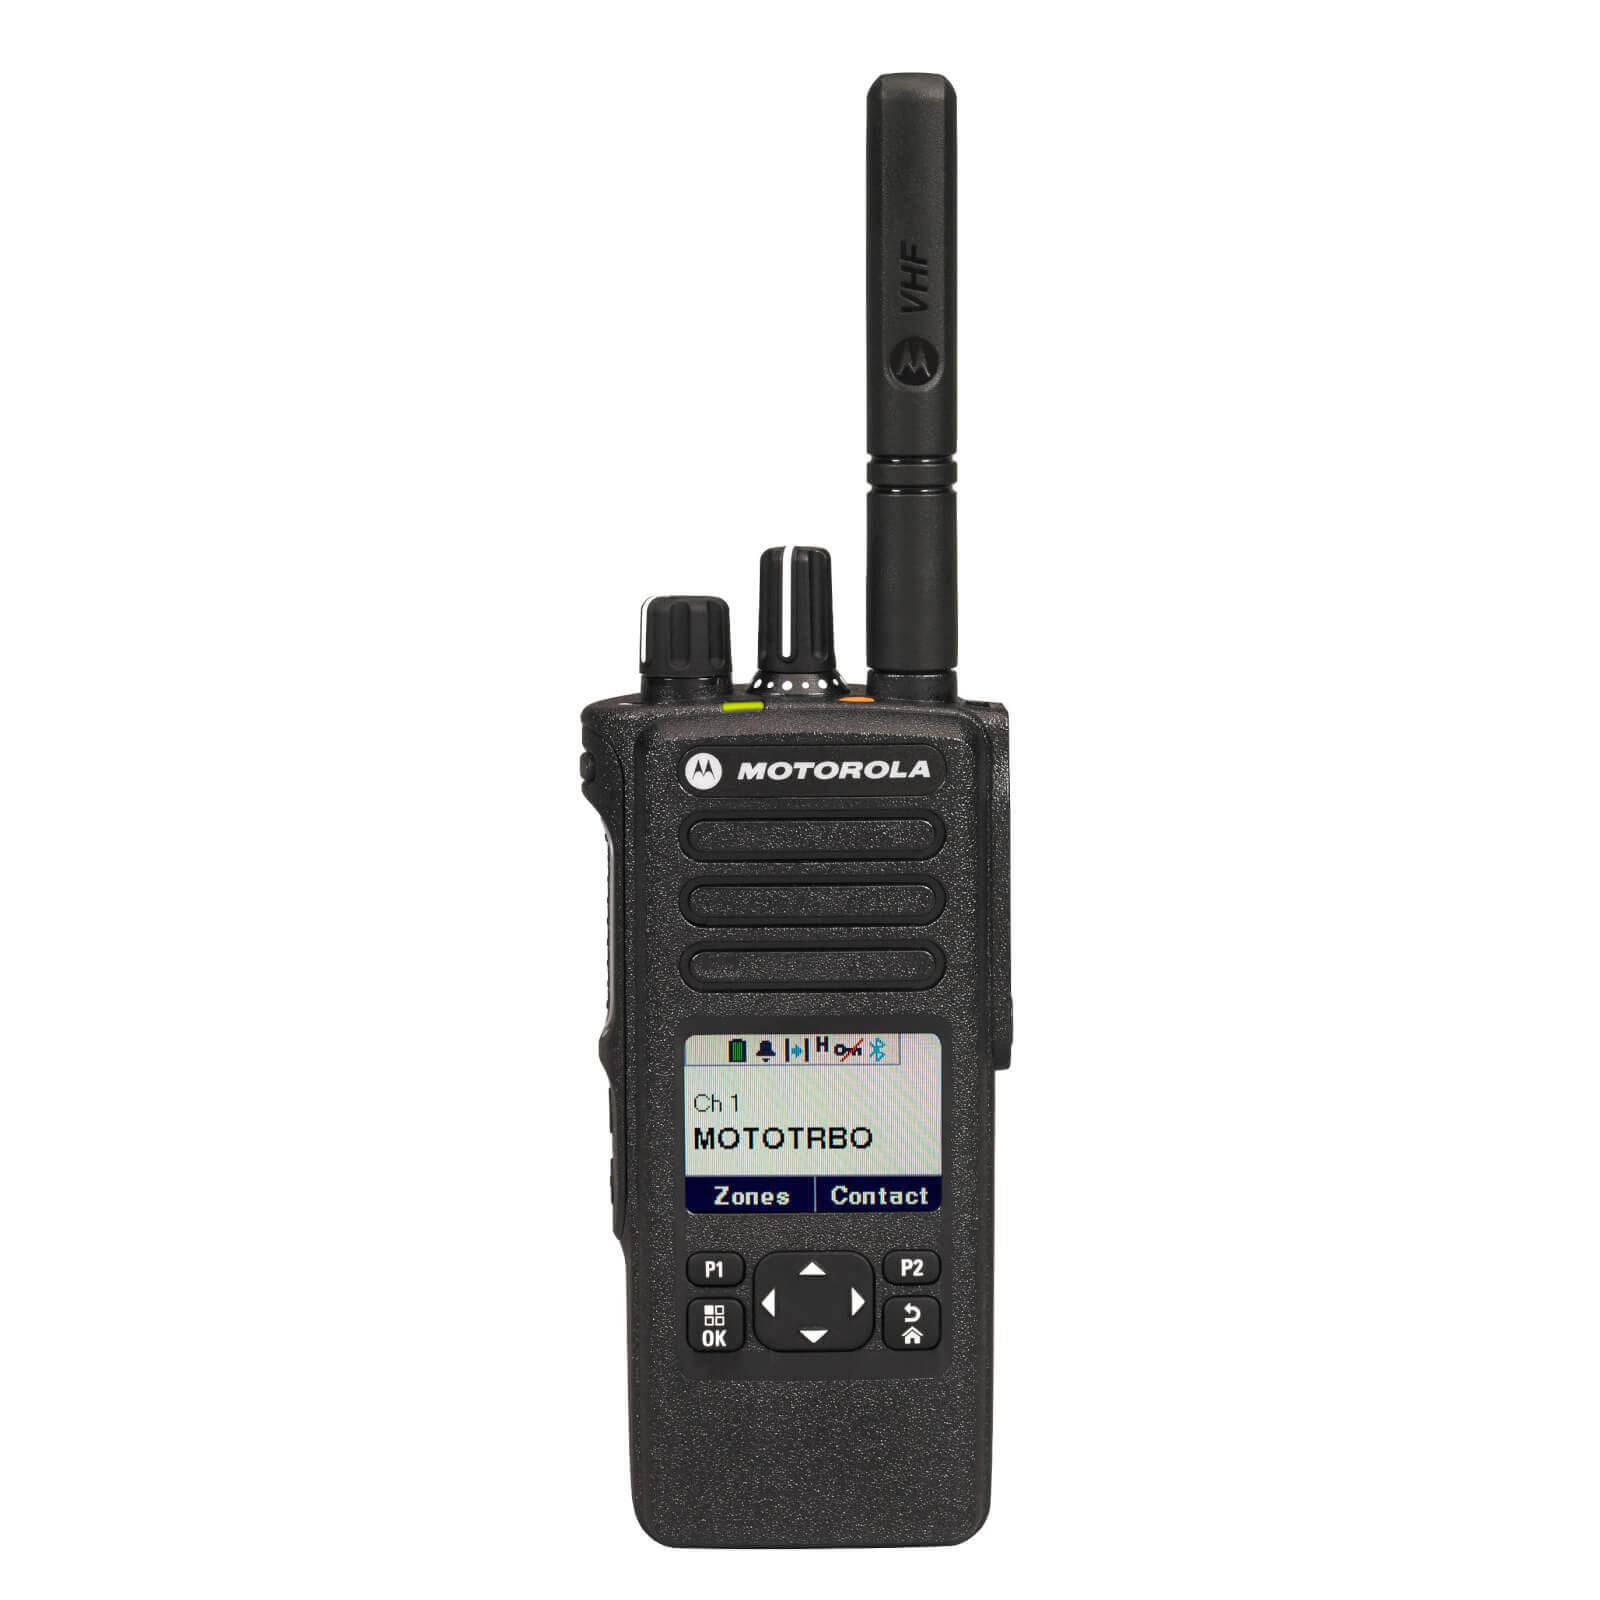 Motorola DP4601e Portable VHF 136-174MHz Ltd Keypad GPS/BT Pack Inc Antenna, Standard Battery &  Belt Clip